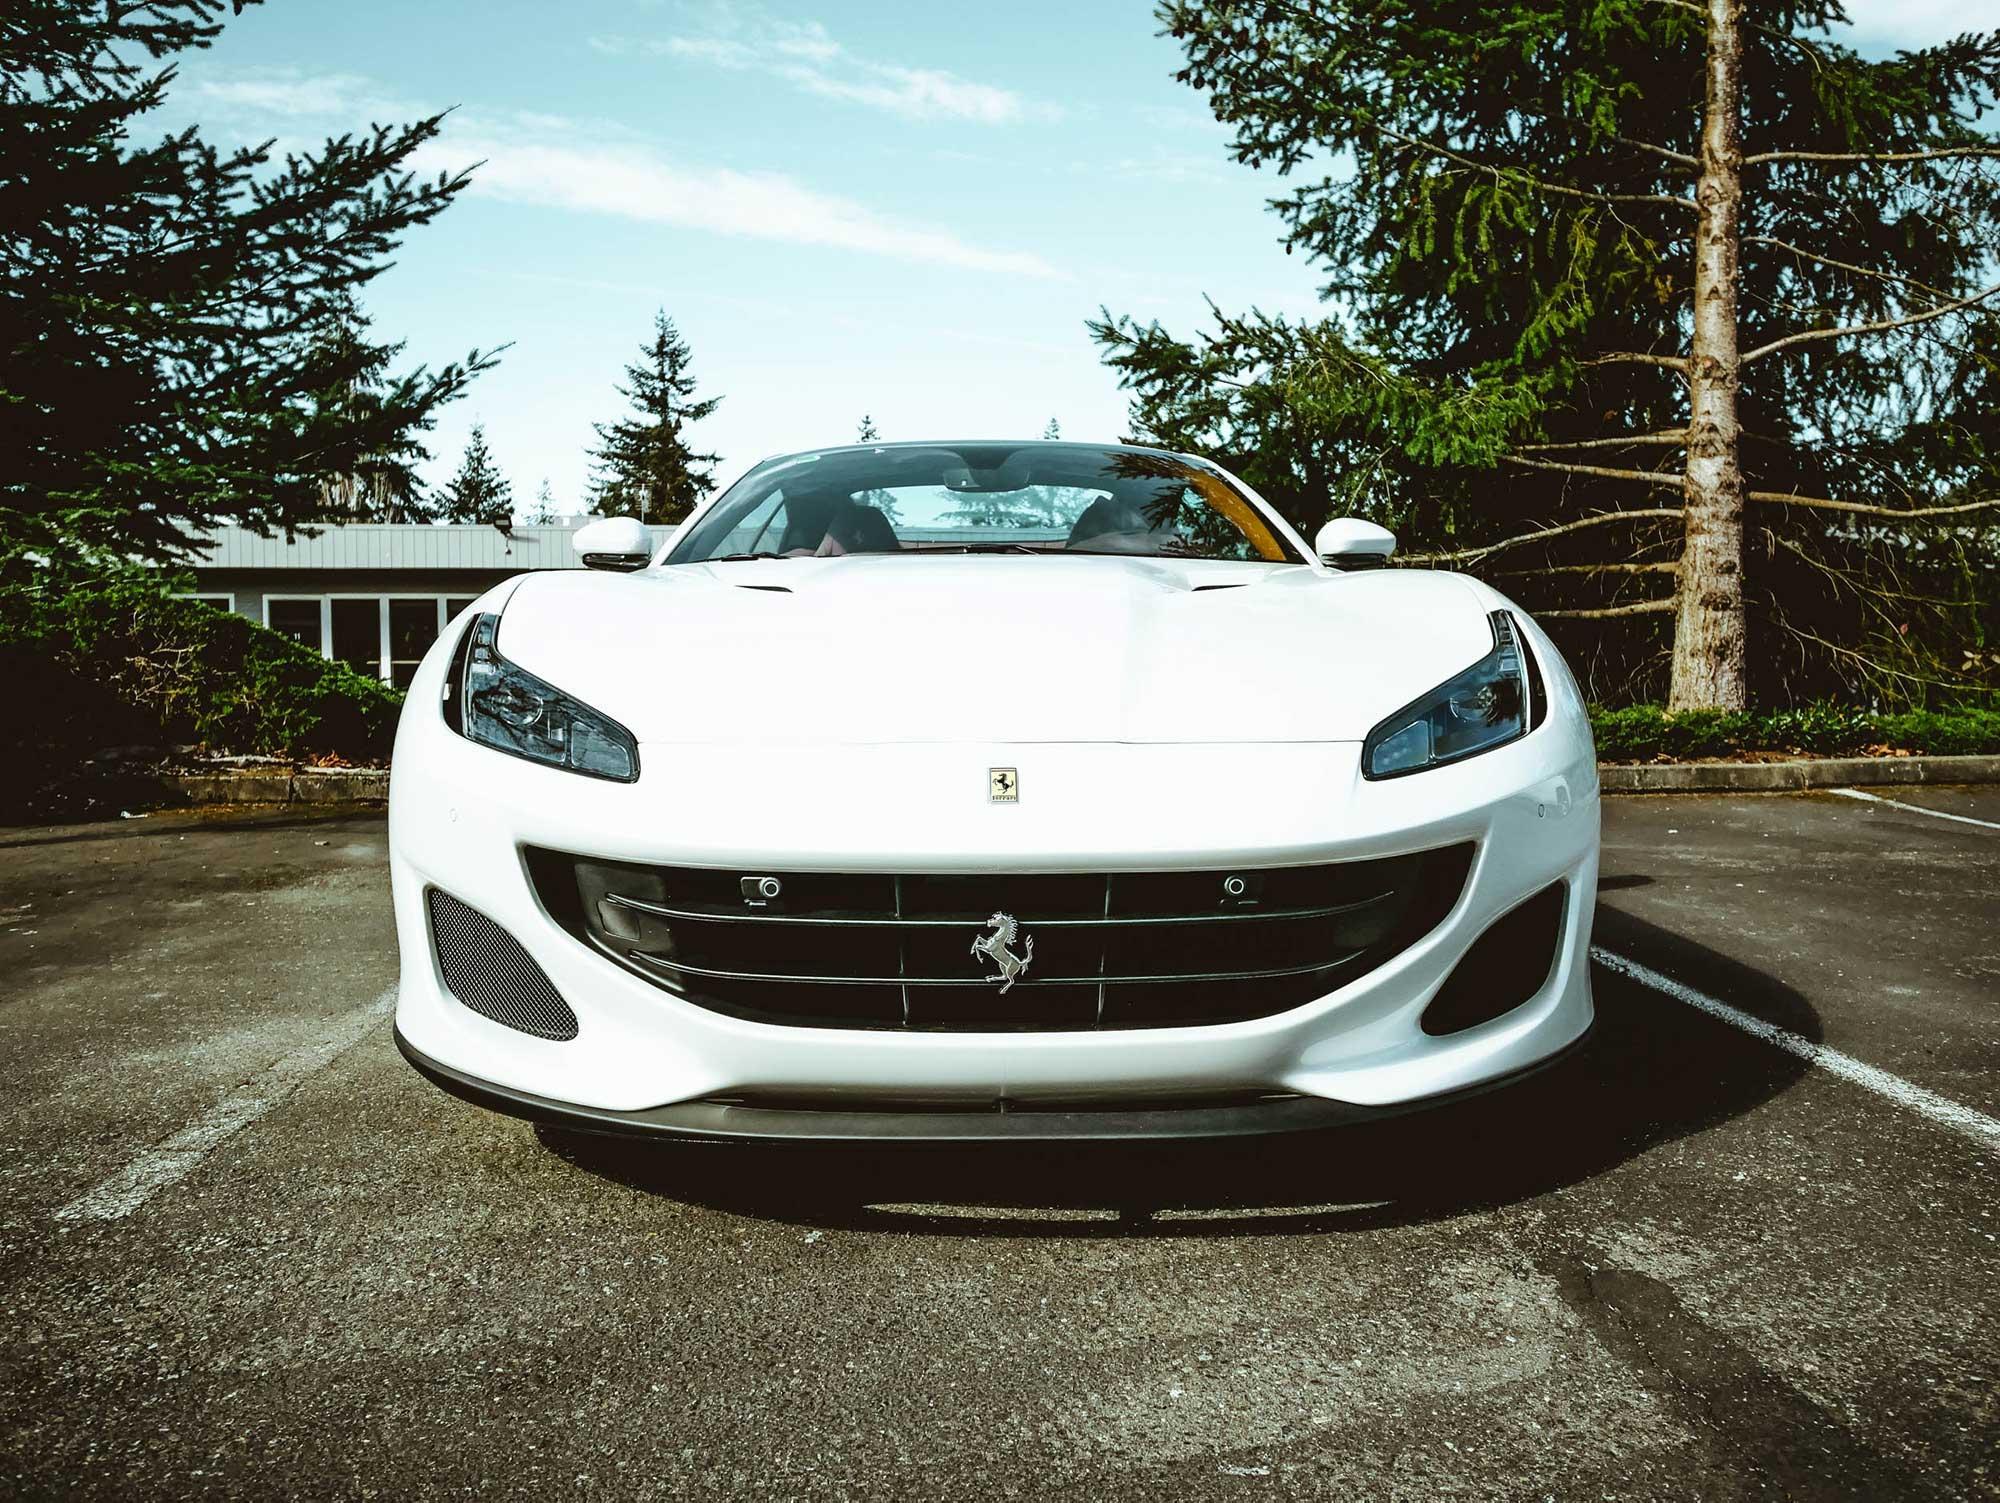 Ferrari Portofino Scrape Armor Skid Plate